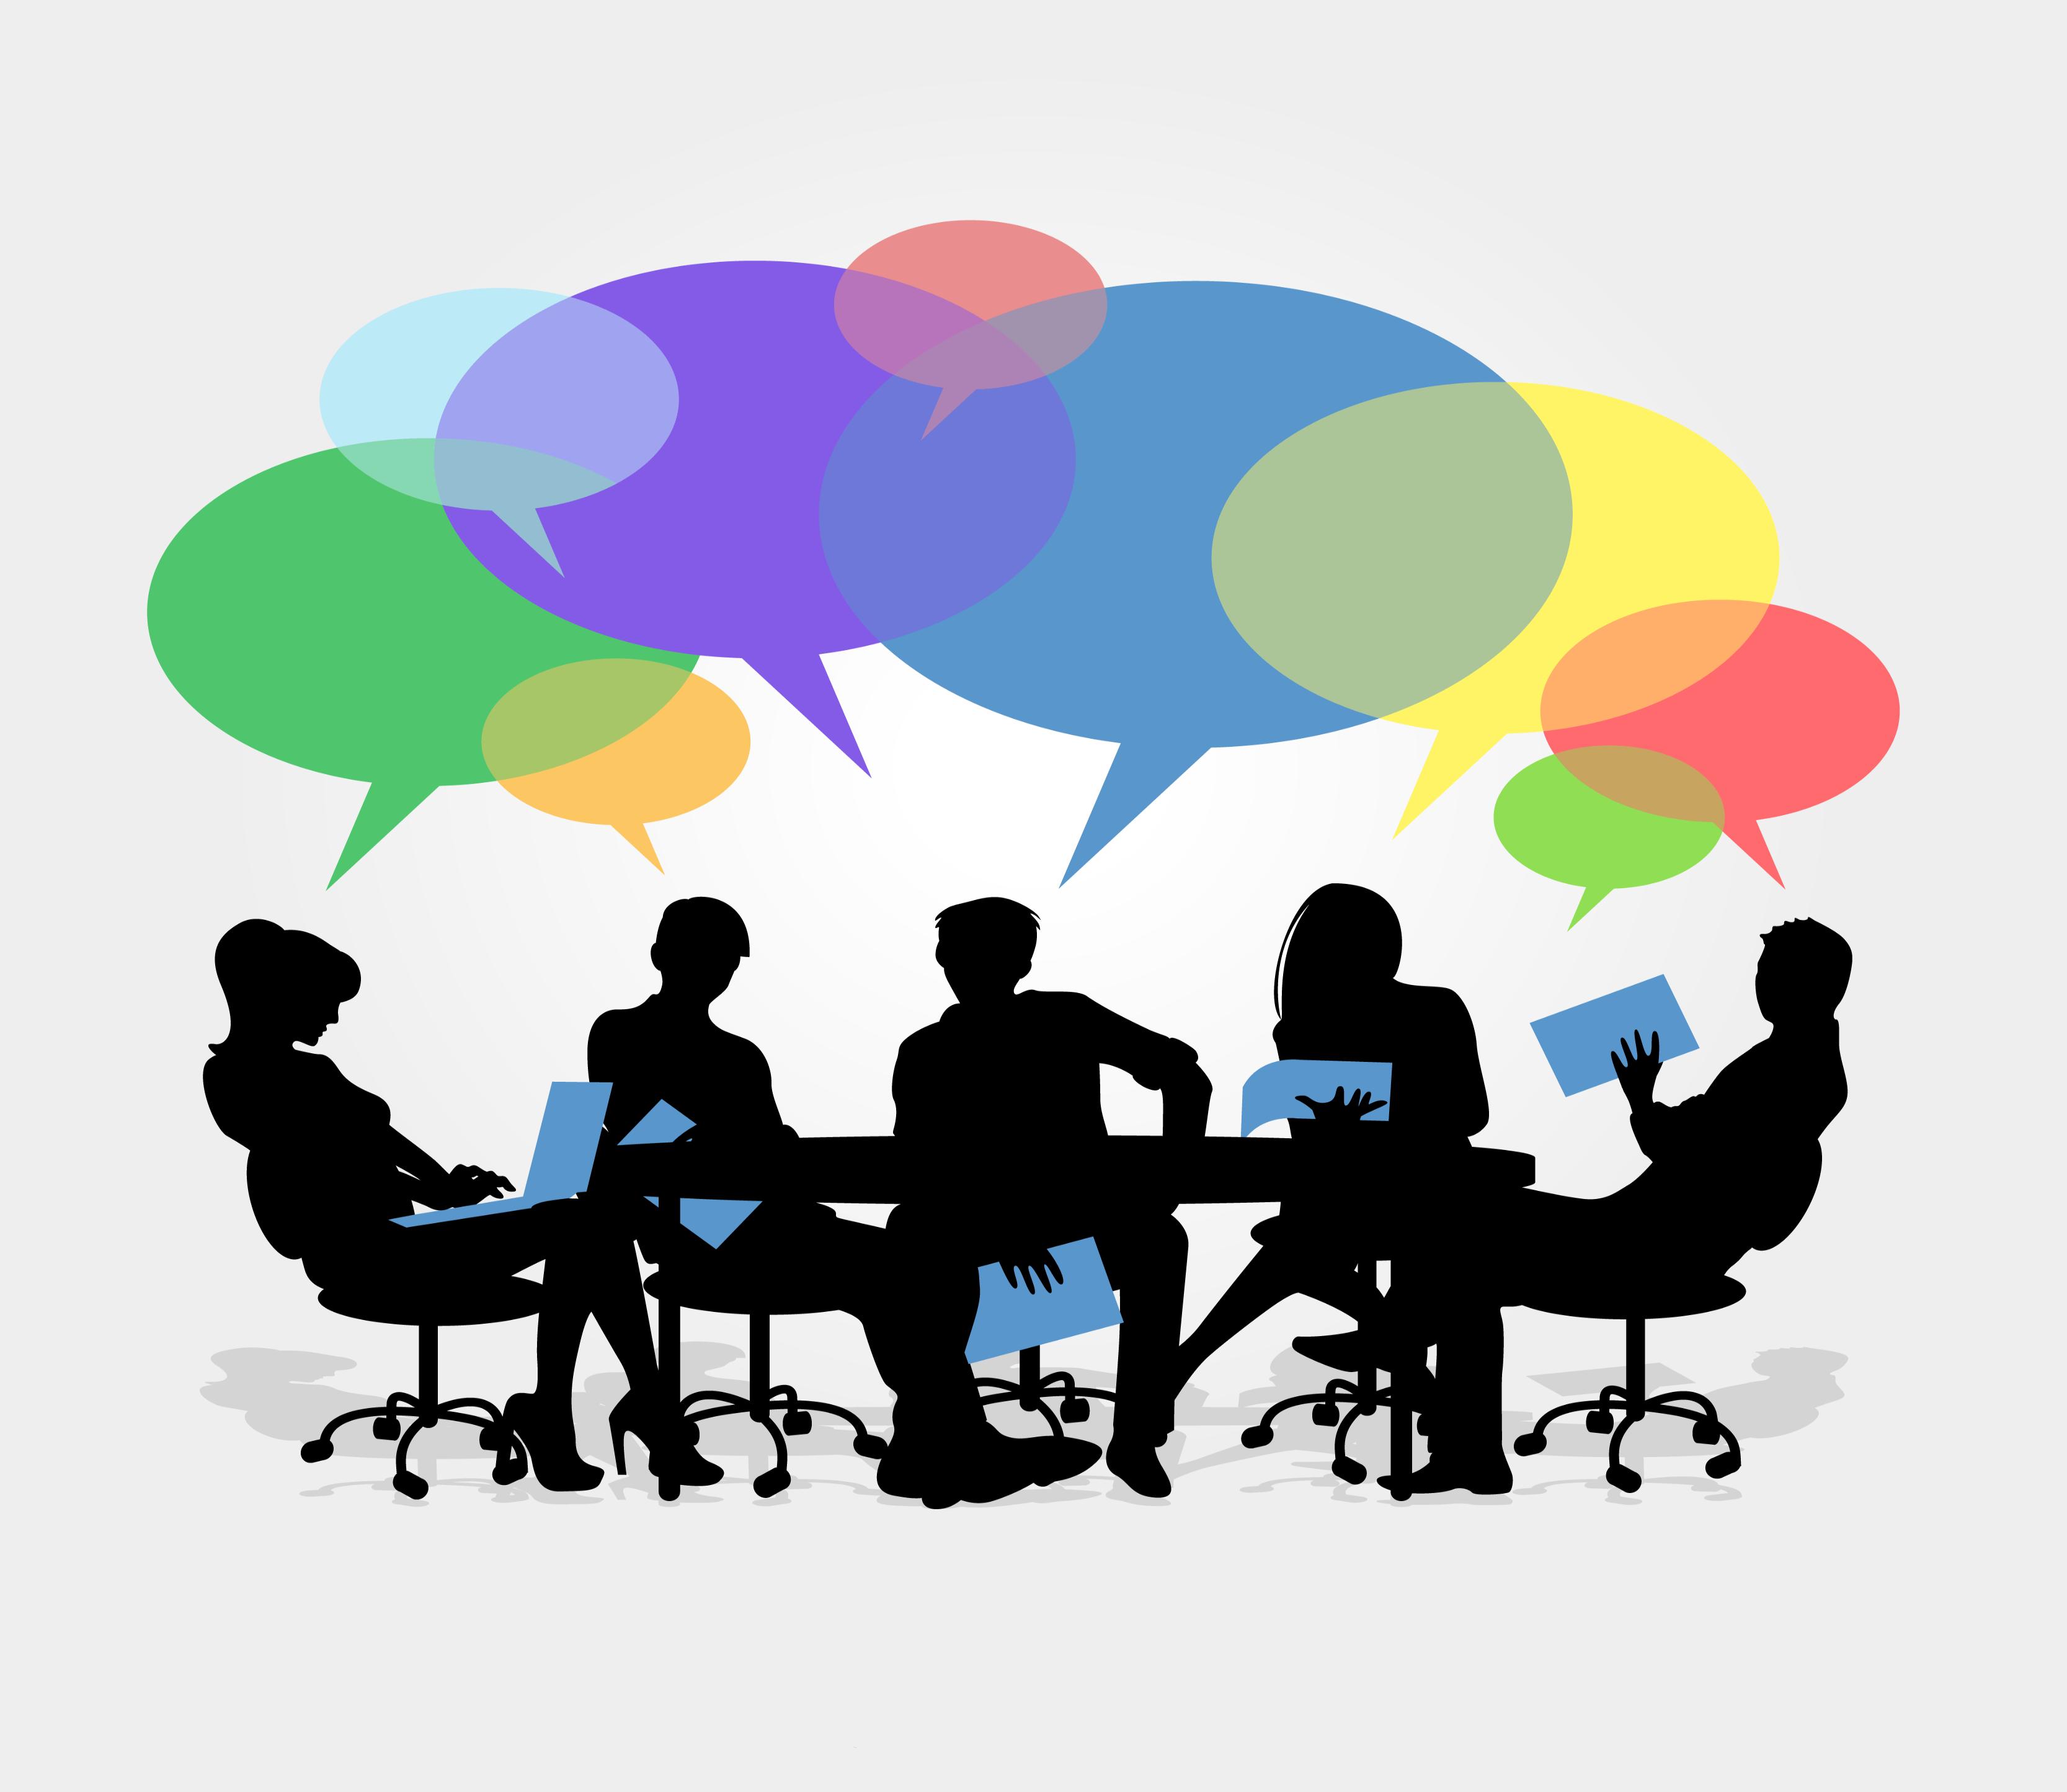 Técnicas aplicadas de comunicación efectiva en el contexto laboral